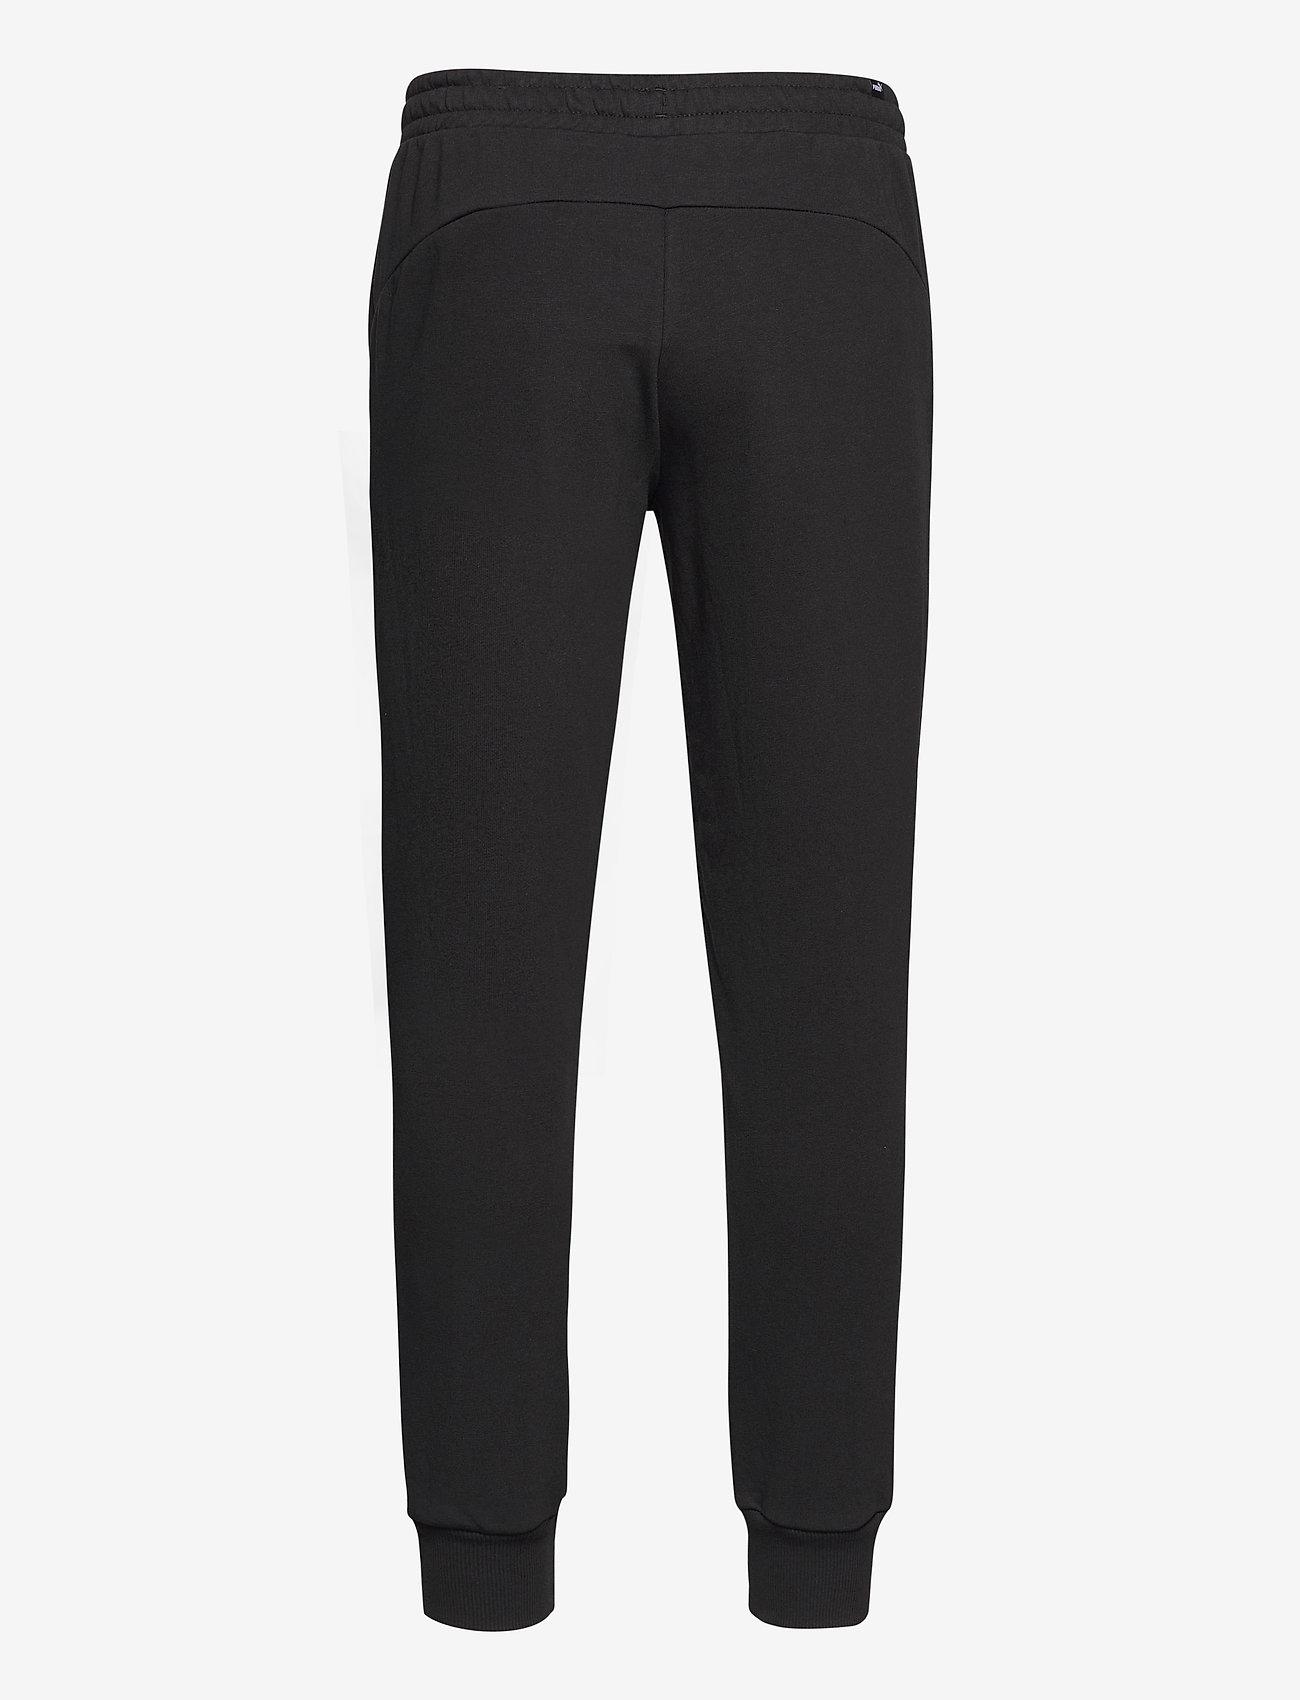 PUMA - NJR 2.0 Track Pant - pants - puma black - 1